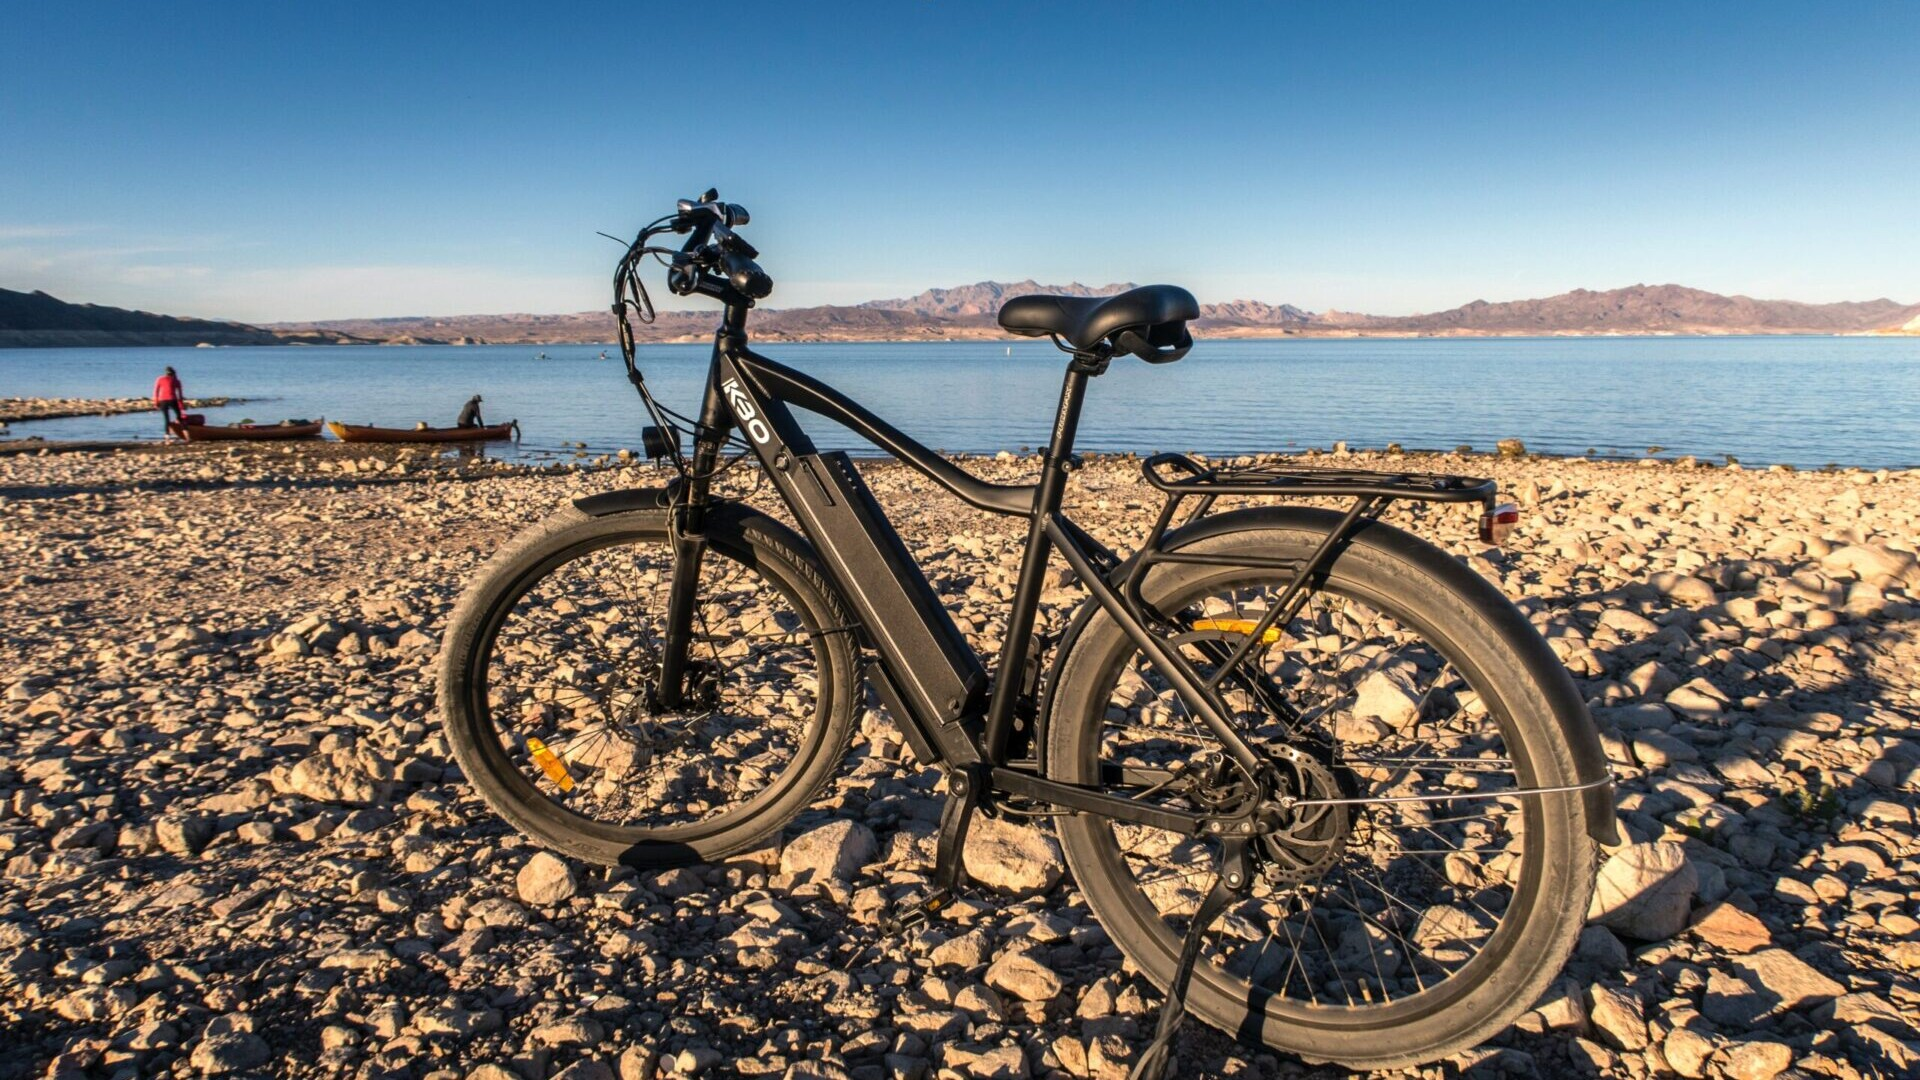 kbo bike qEsoO8Y1wEc unsplash scaled